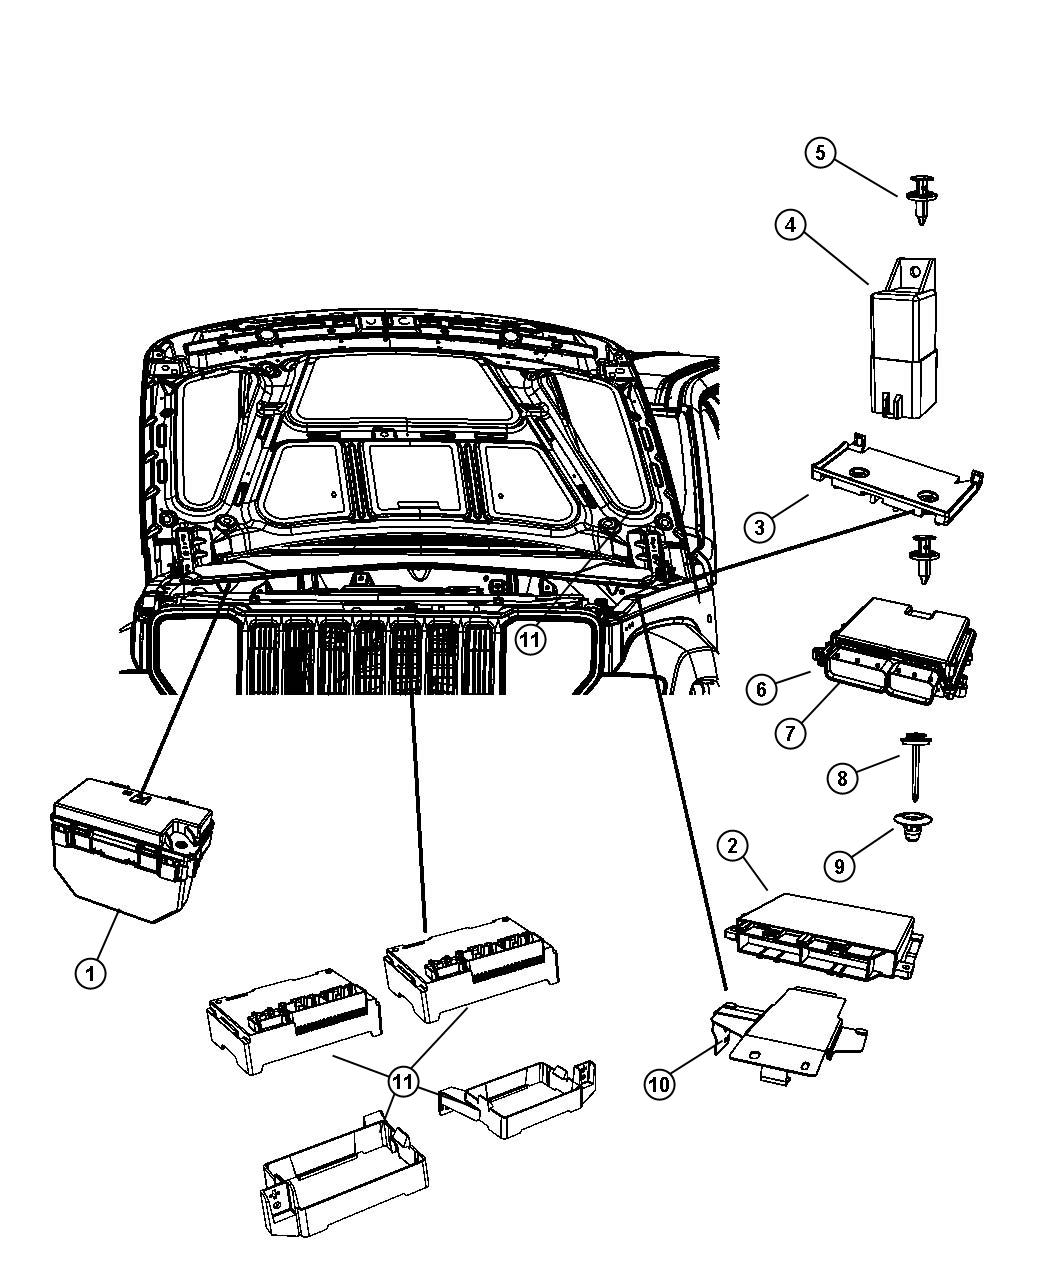 05094159ae jeep module powertrain control engine. Black Bedroom Furniture Sets. Home Design Ideas